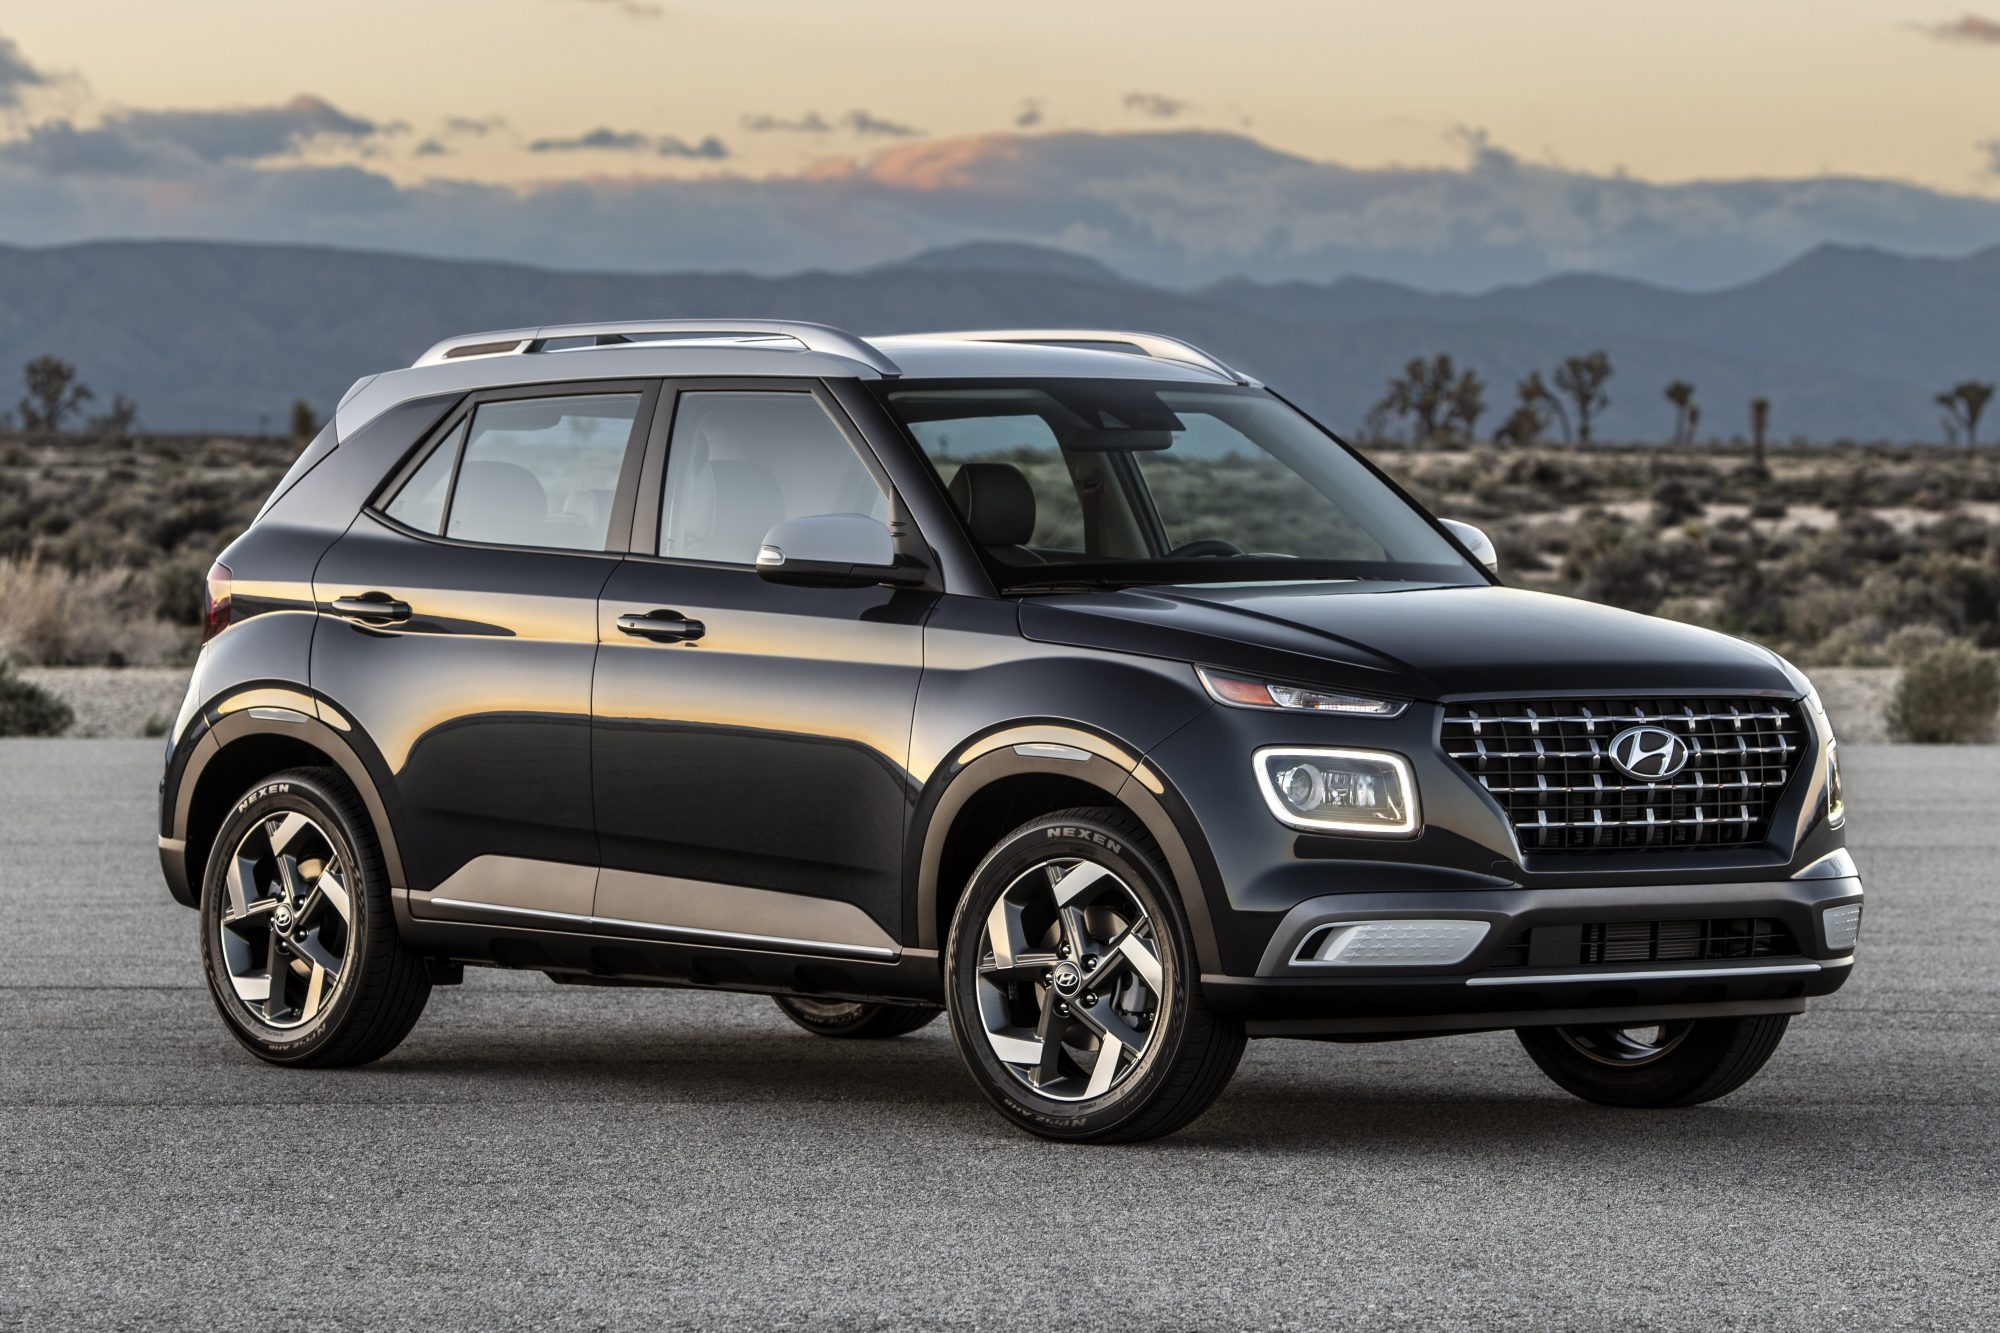 Hyundai Venue teste brasil (2)